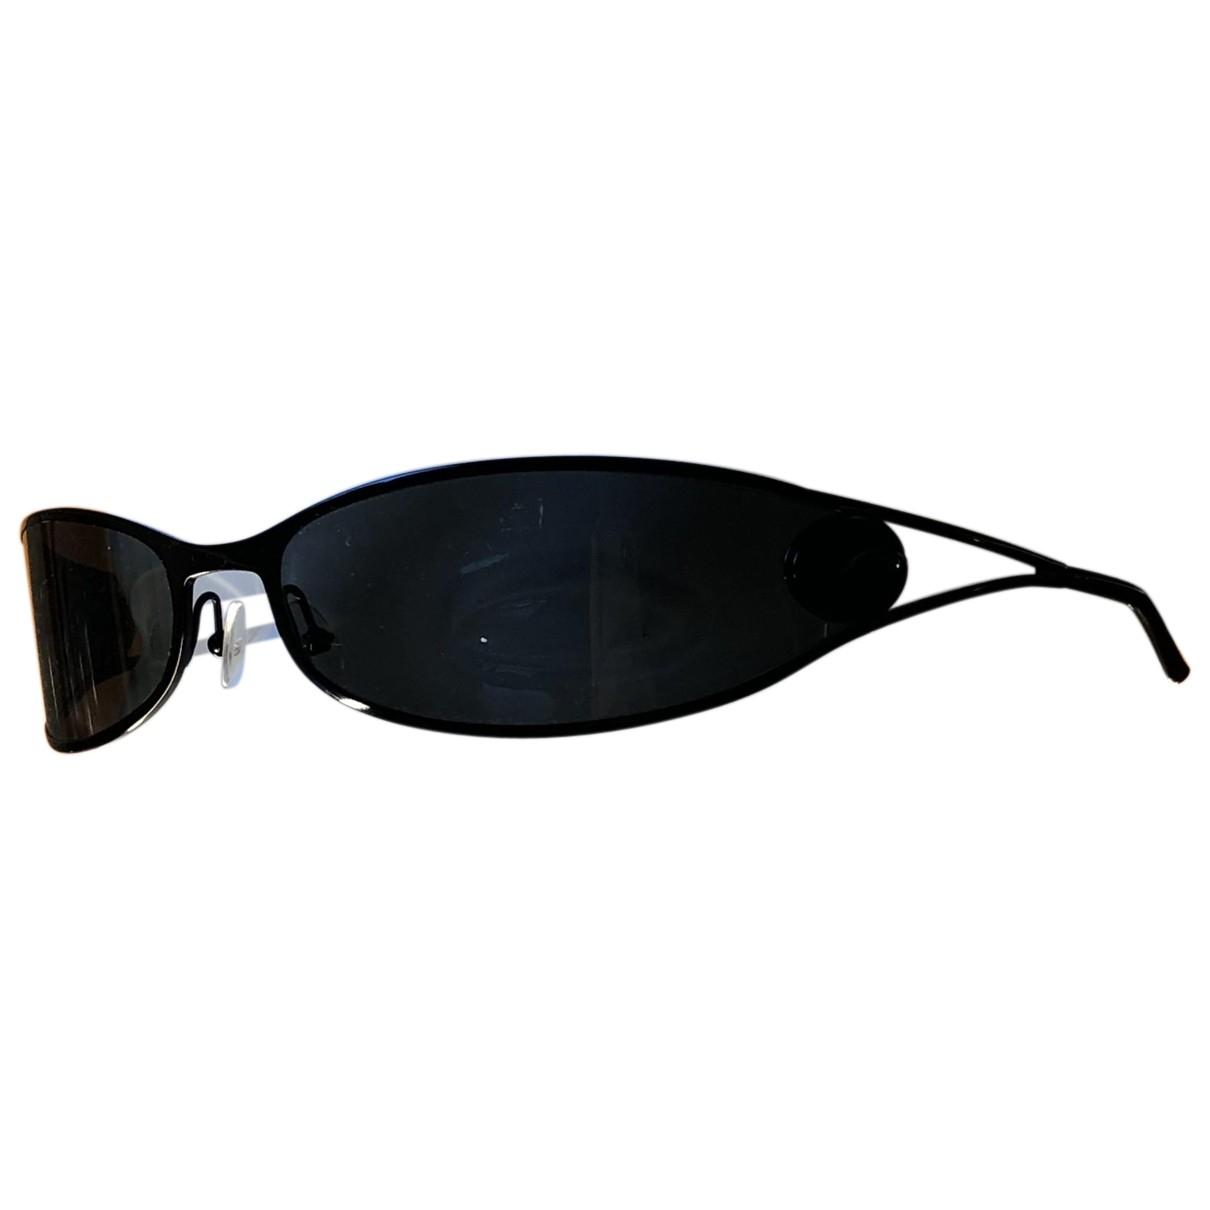 Dior N Black Metal Sunglasses for Women N